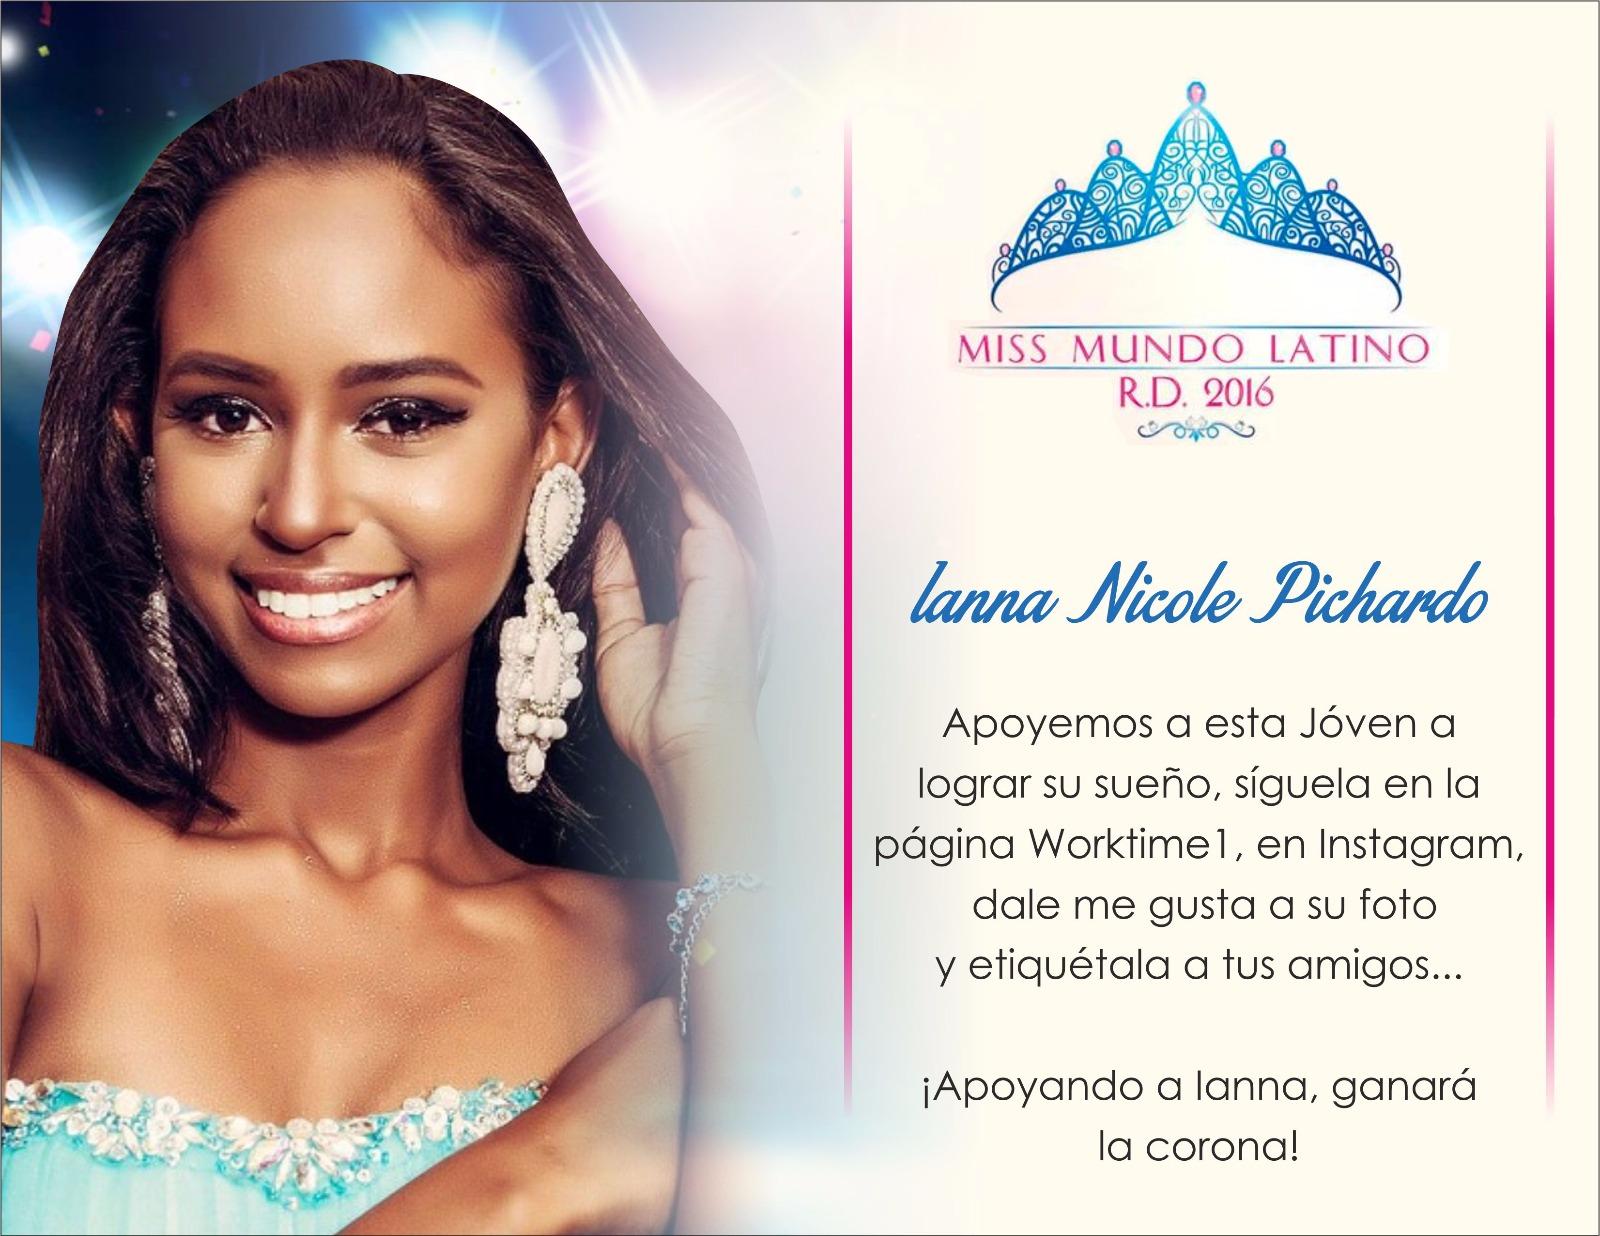 IANNA NICOLE PICHARDO